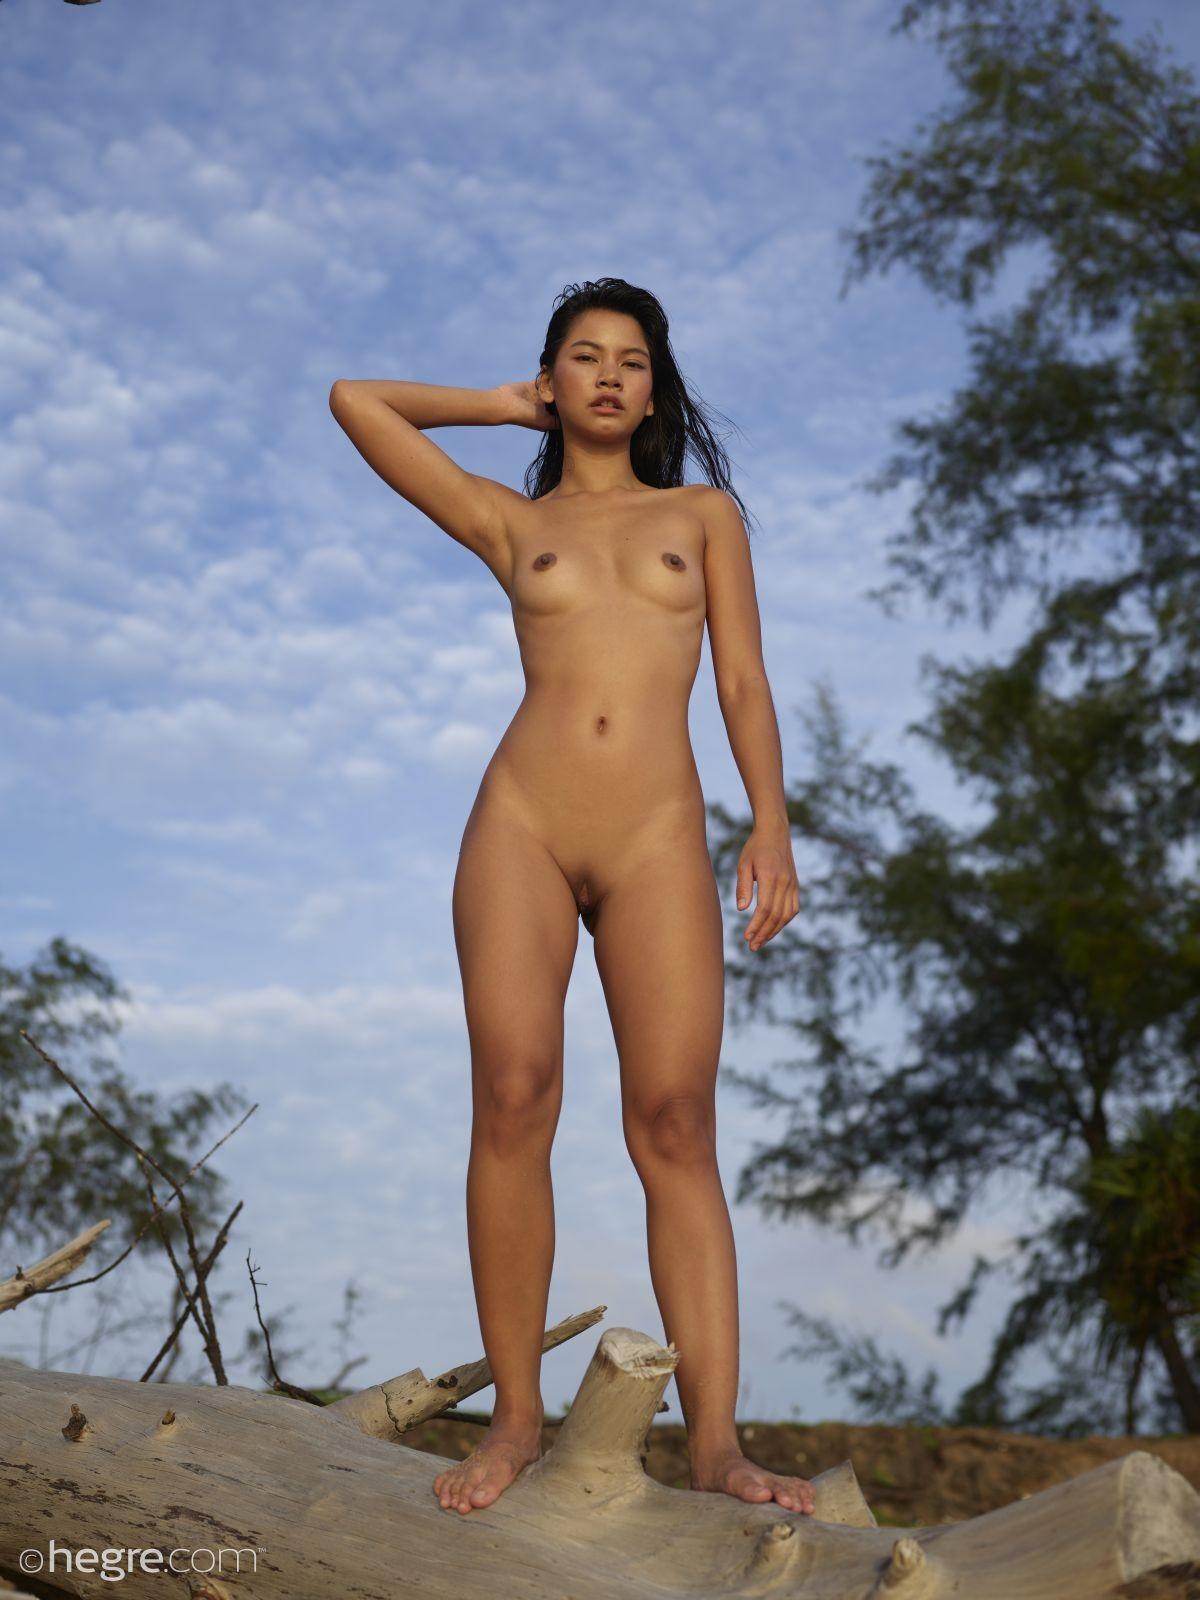 Обнаженная молодая тайка на природе - фото